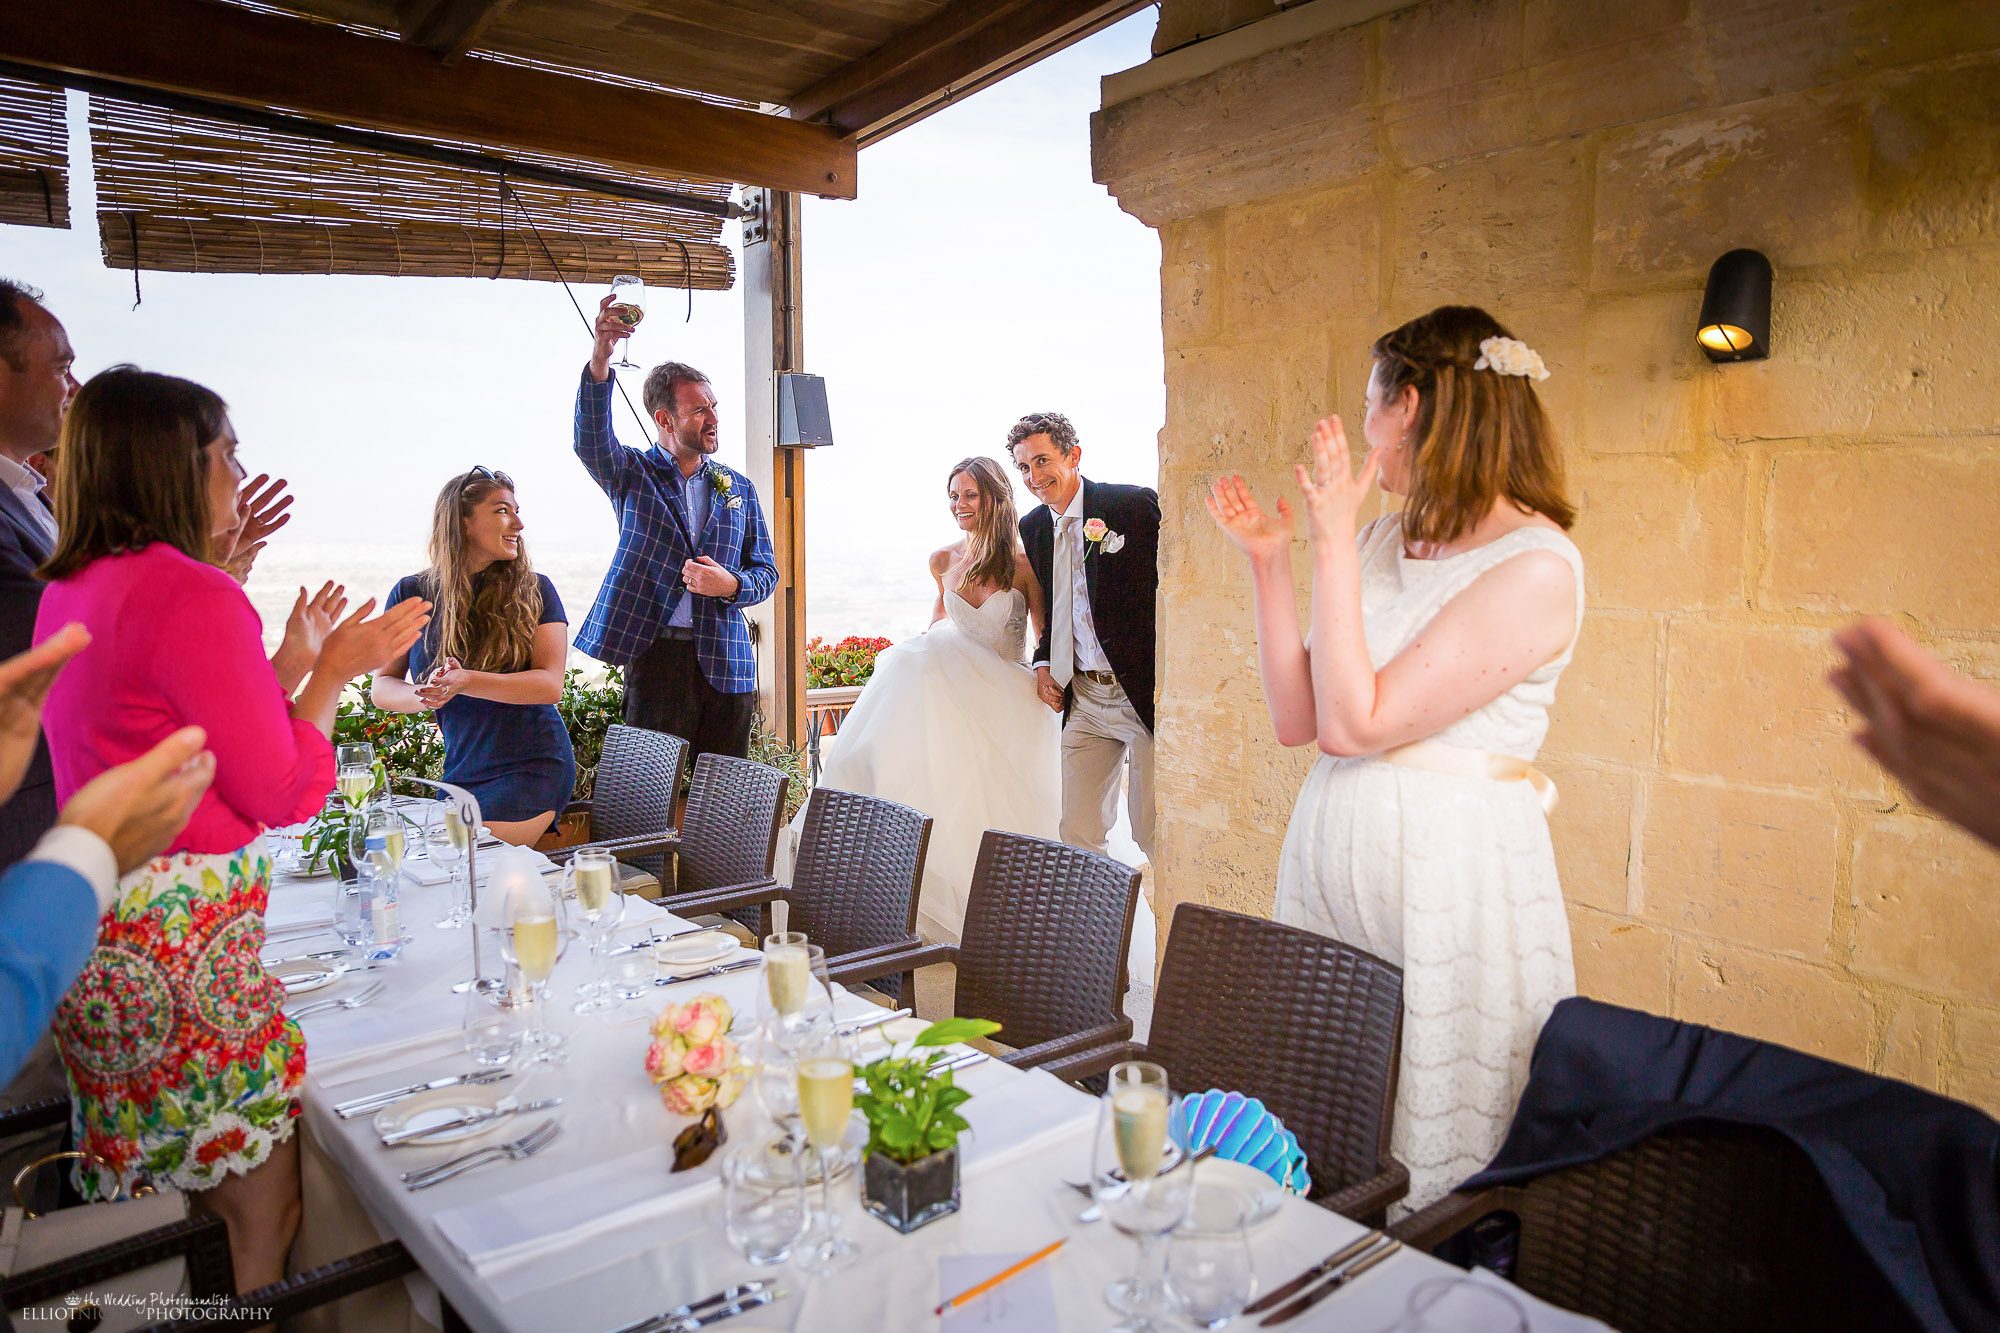 bride-groom-arrive-dinner-photography-reception